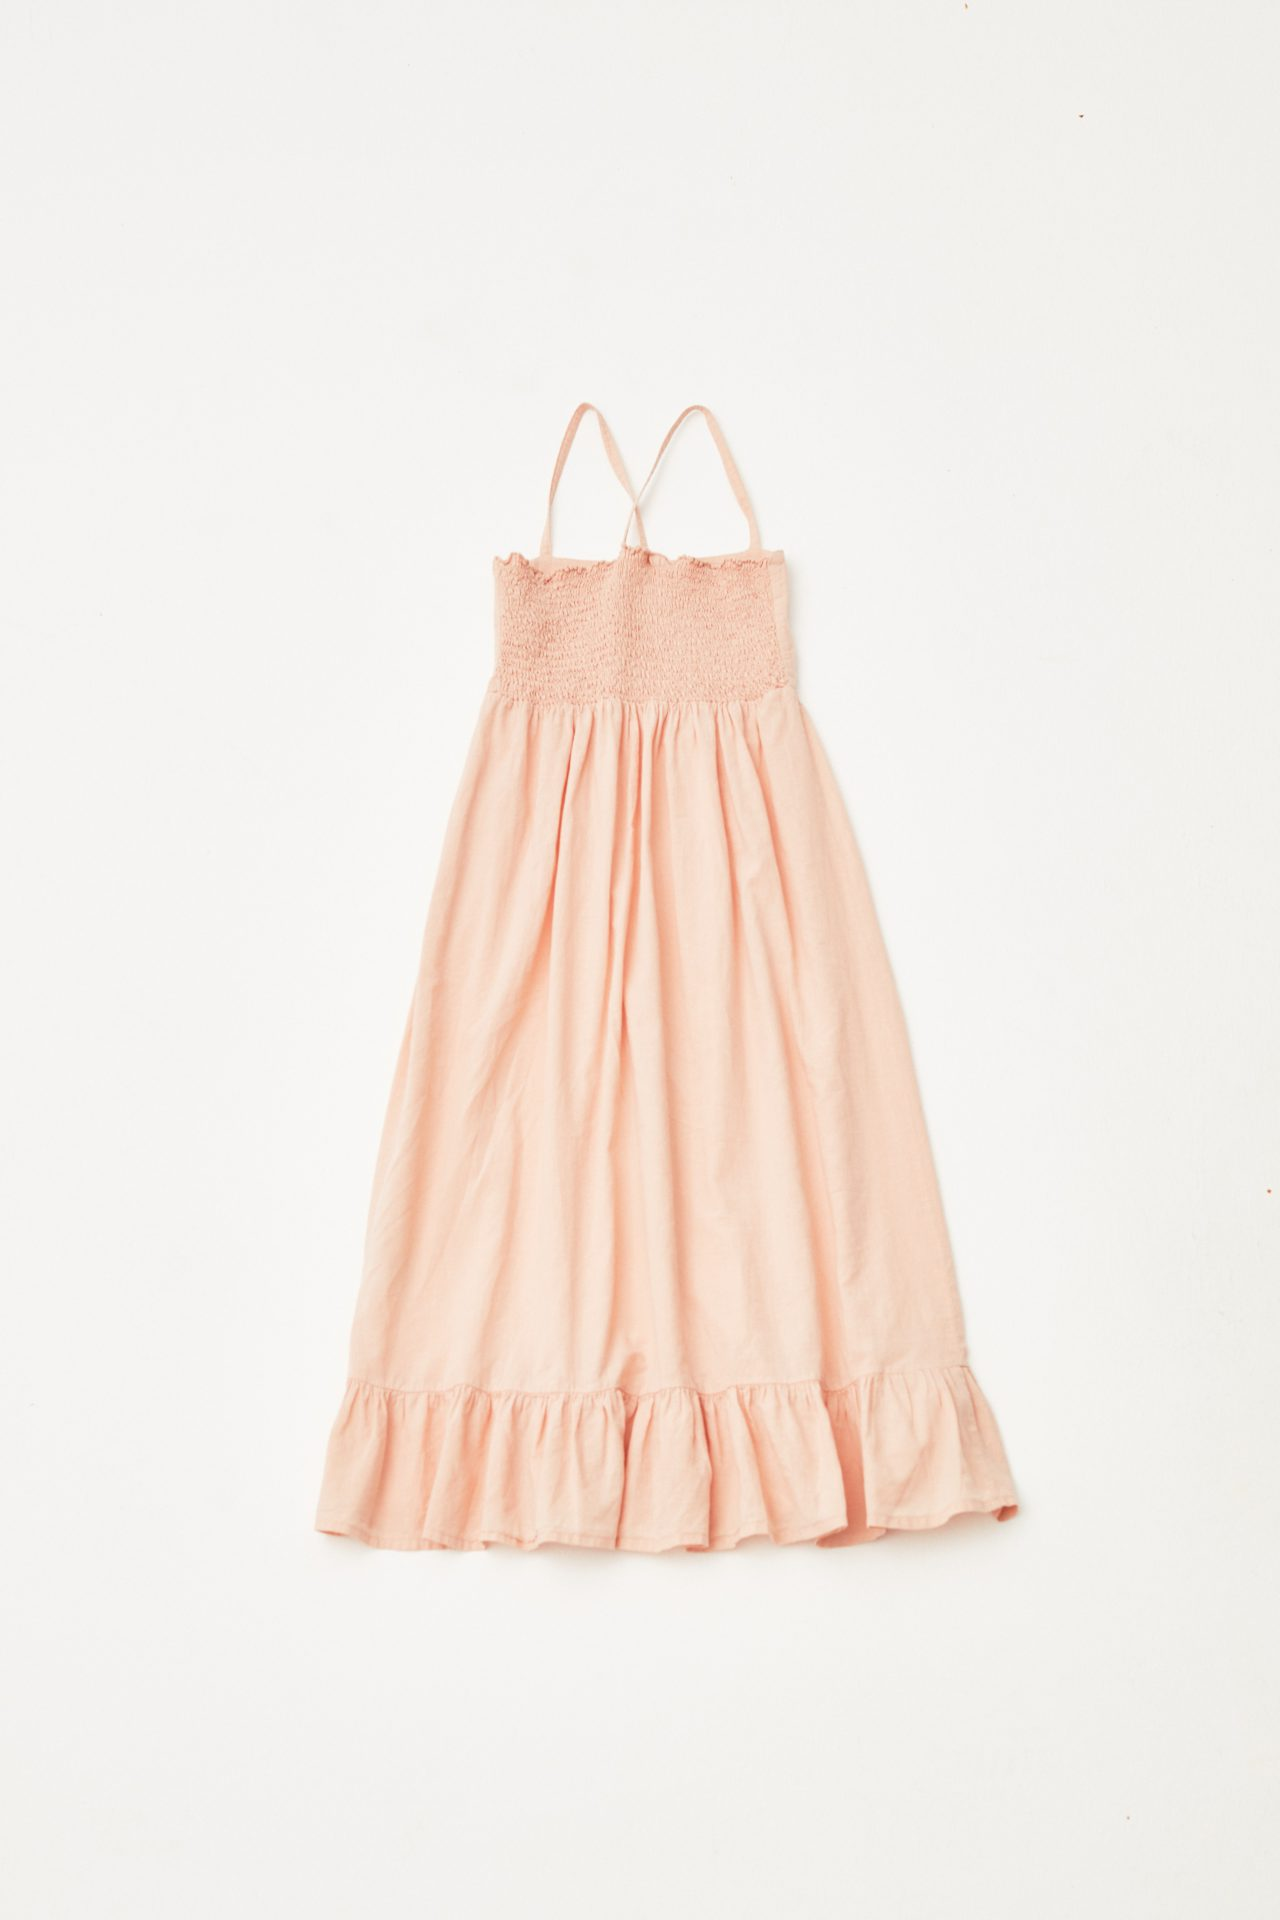 Il Dolce Far Niente Dress back